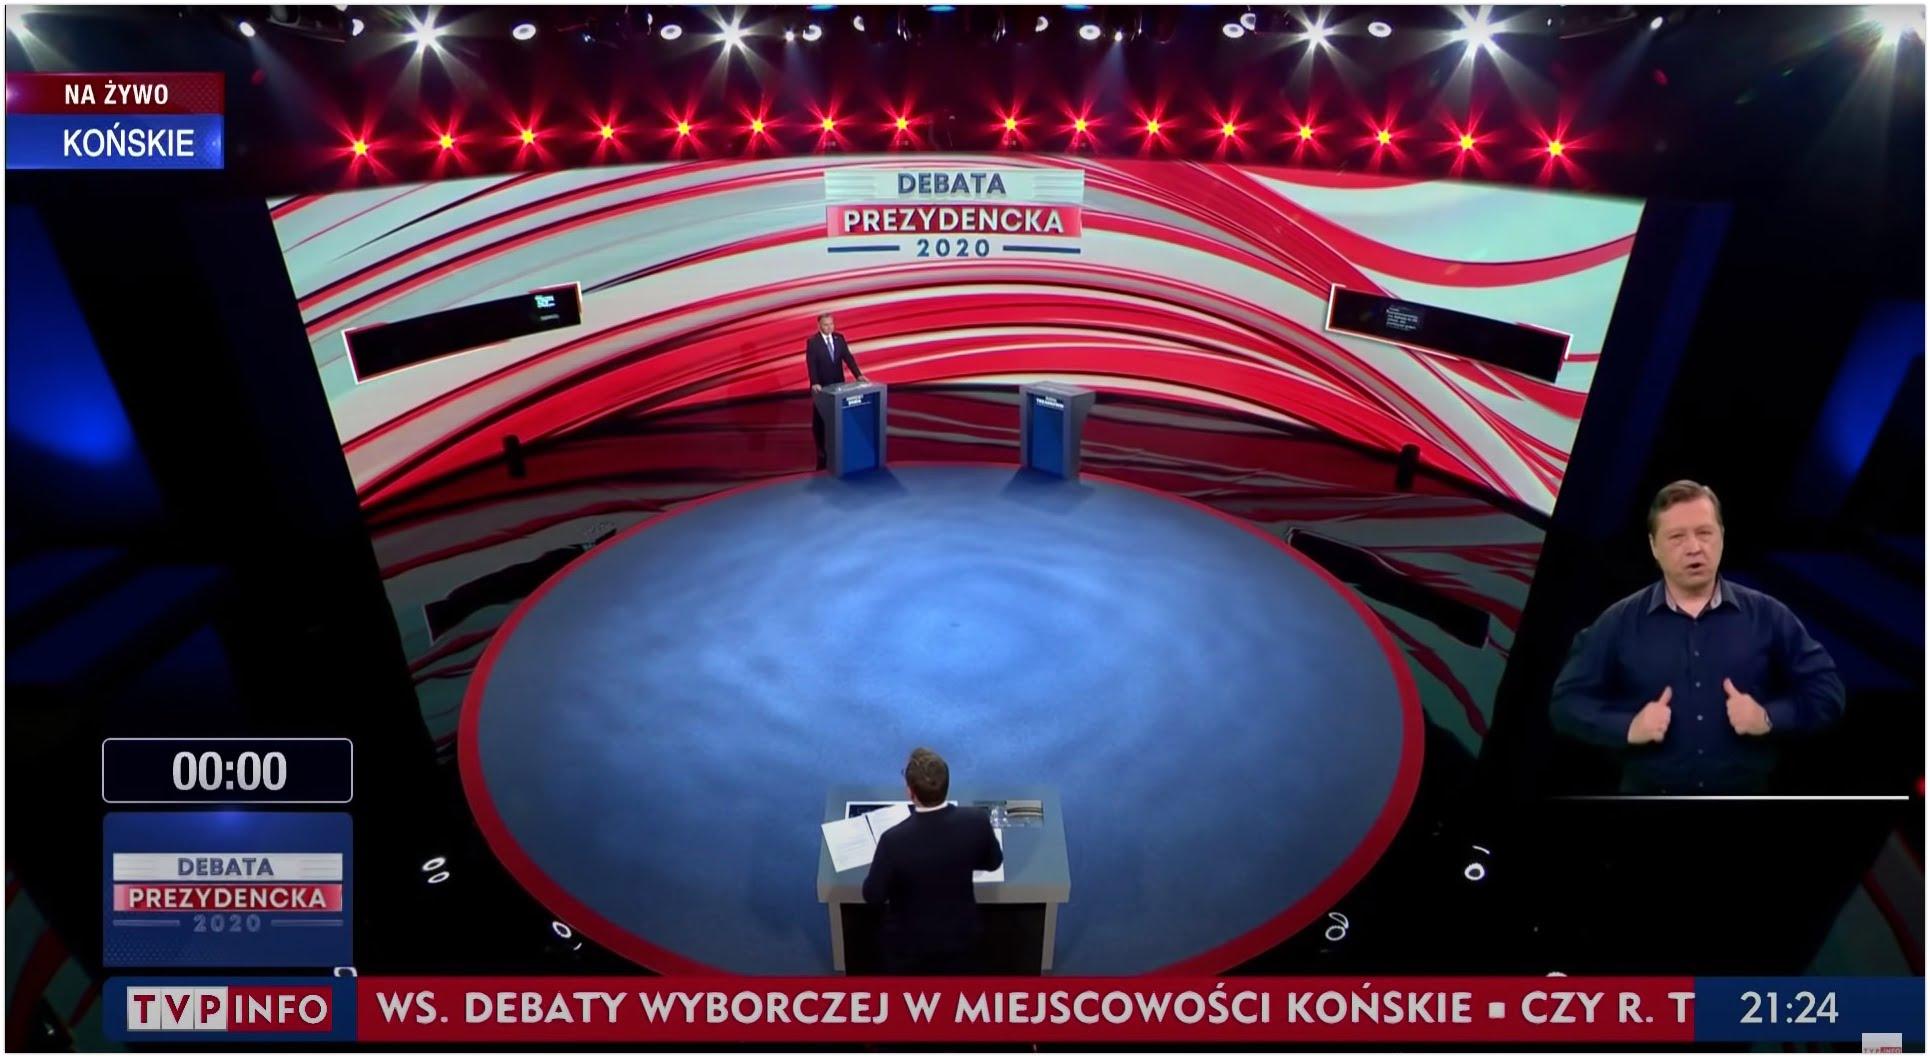 MIchał Adamczyk / Prompter